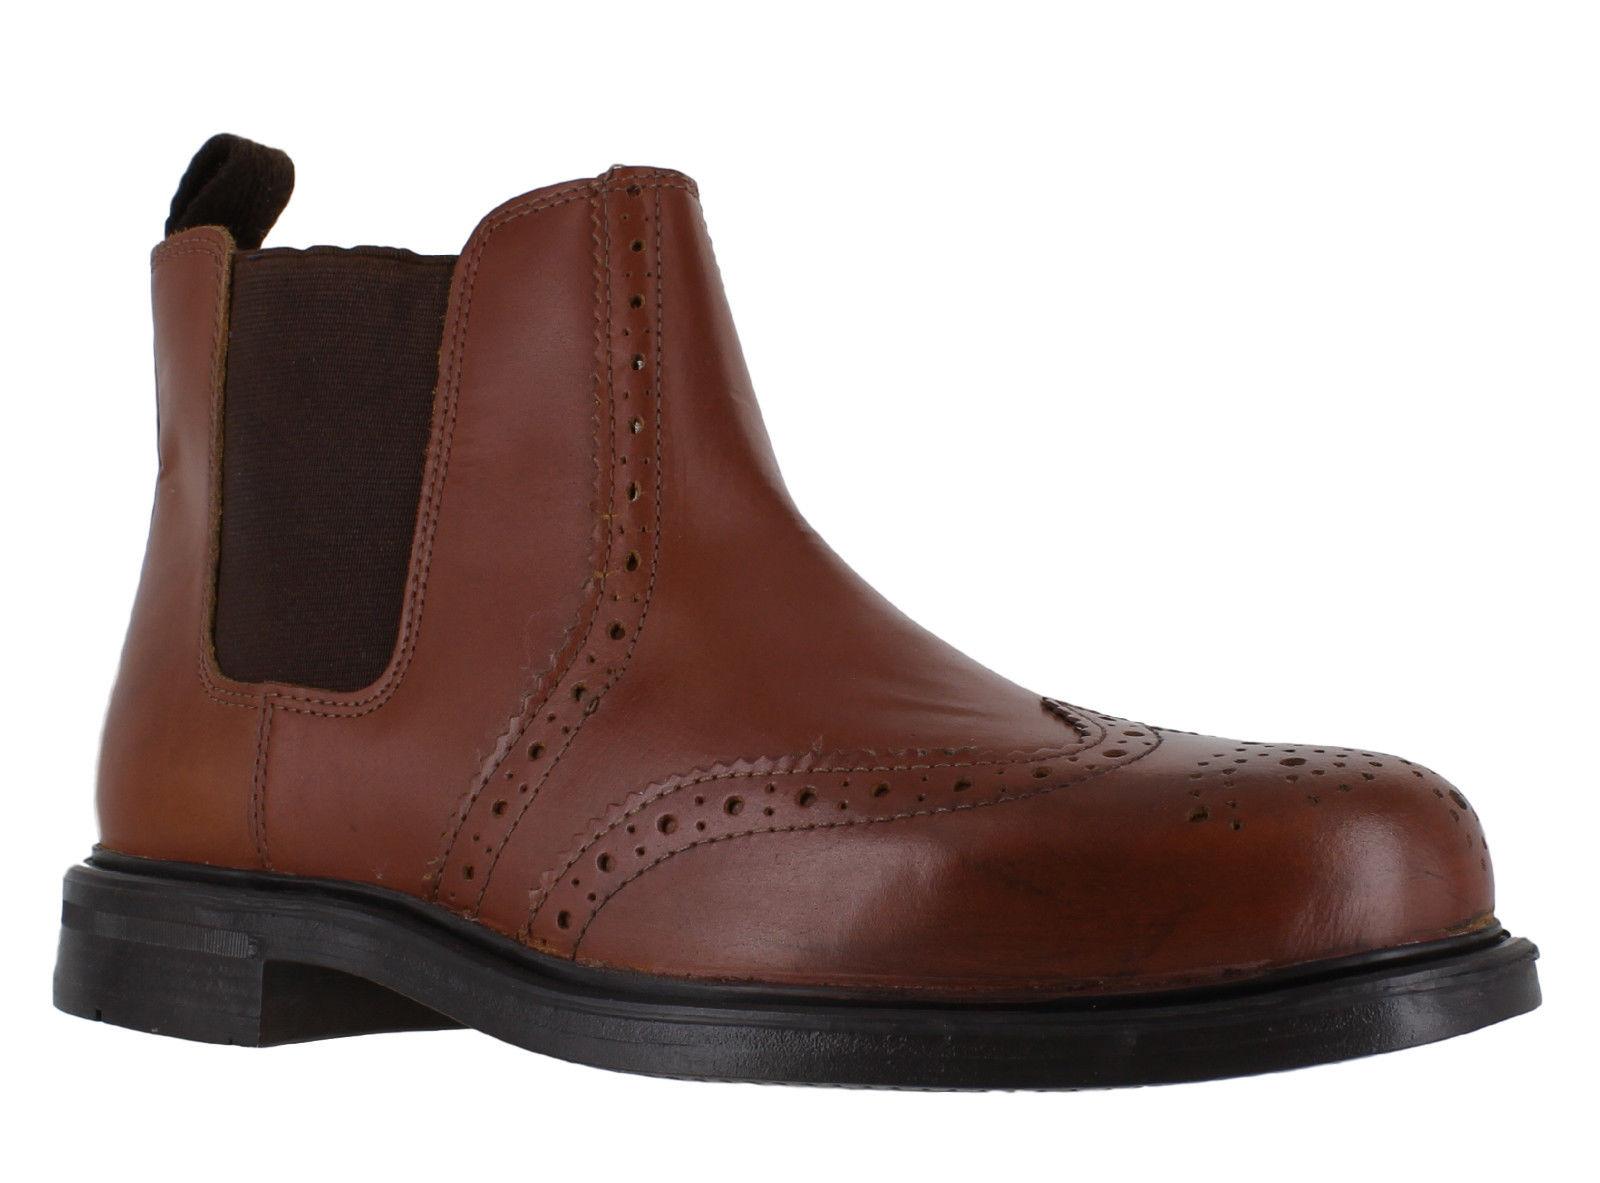 Oaktrak Castaña APPLEBY Hombre Castaña Oaktrak Zapatos Oxford de piel SIN  CIERRES 7af137 4397e6fe2b57